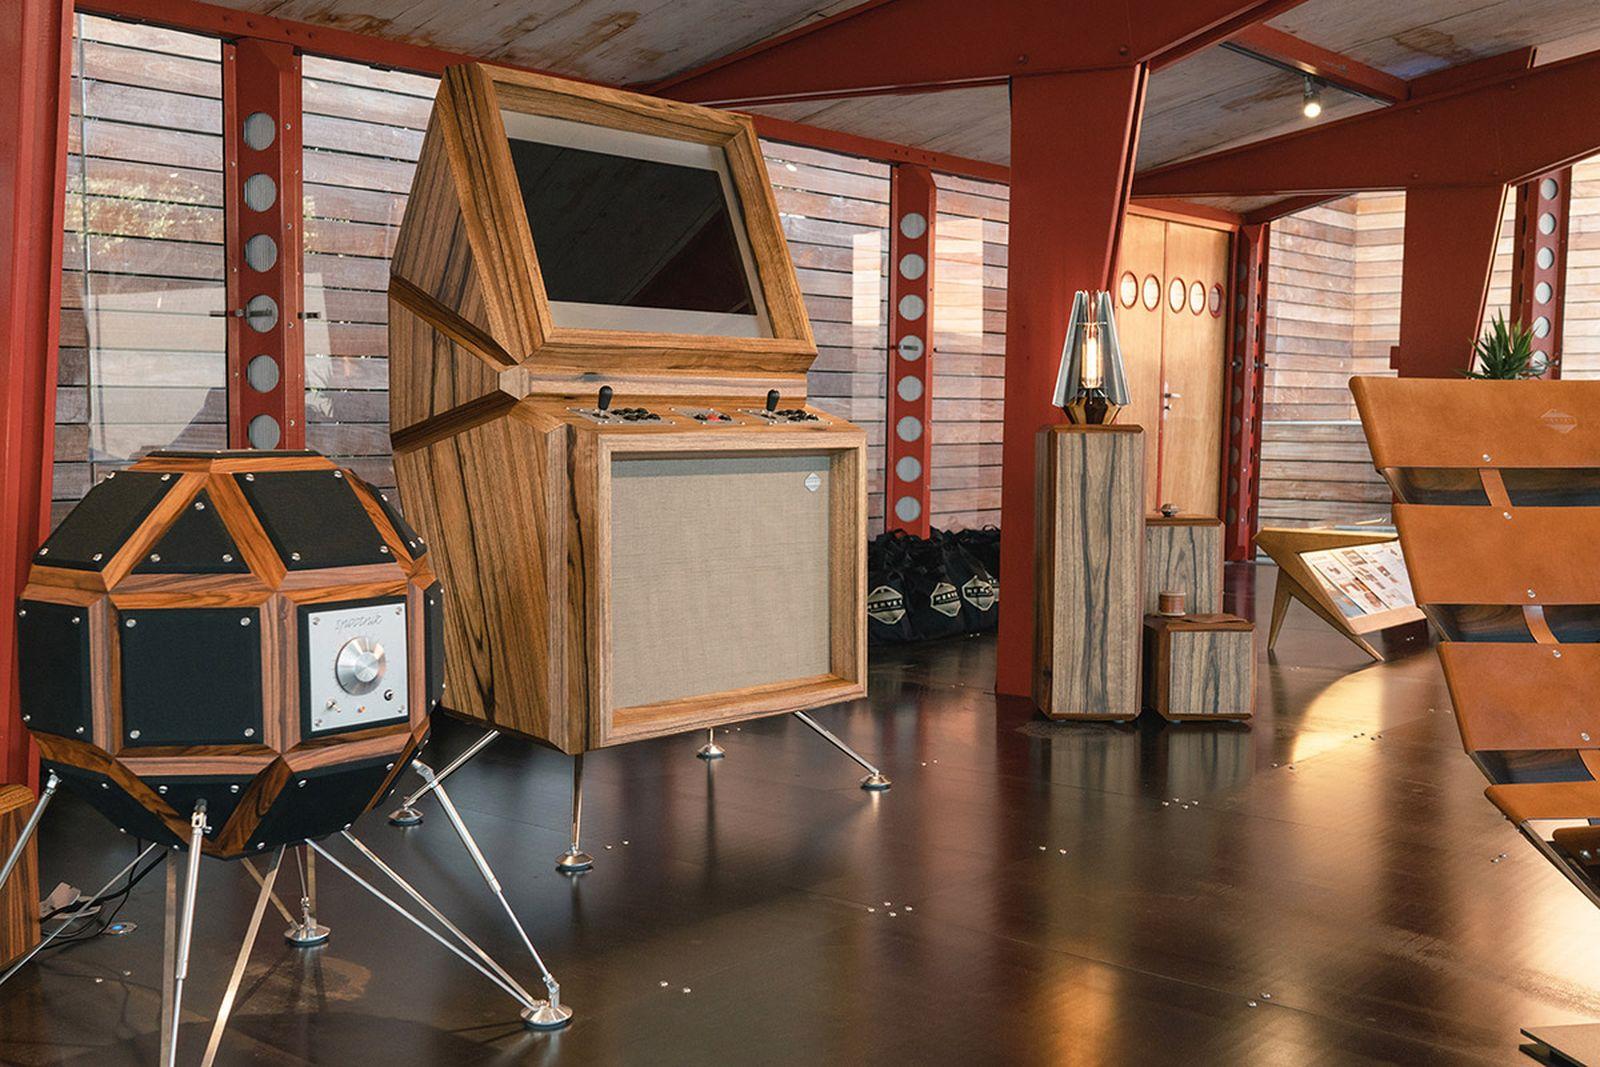 hervet exhibition maxfield la Cedric Hervet Daft Punk